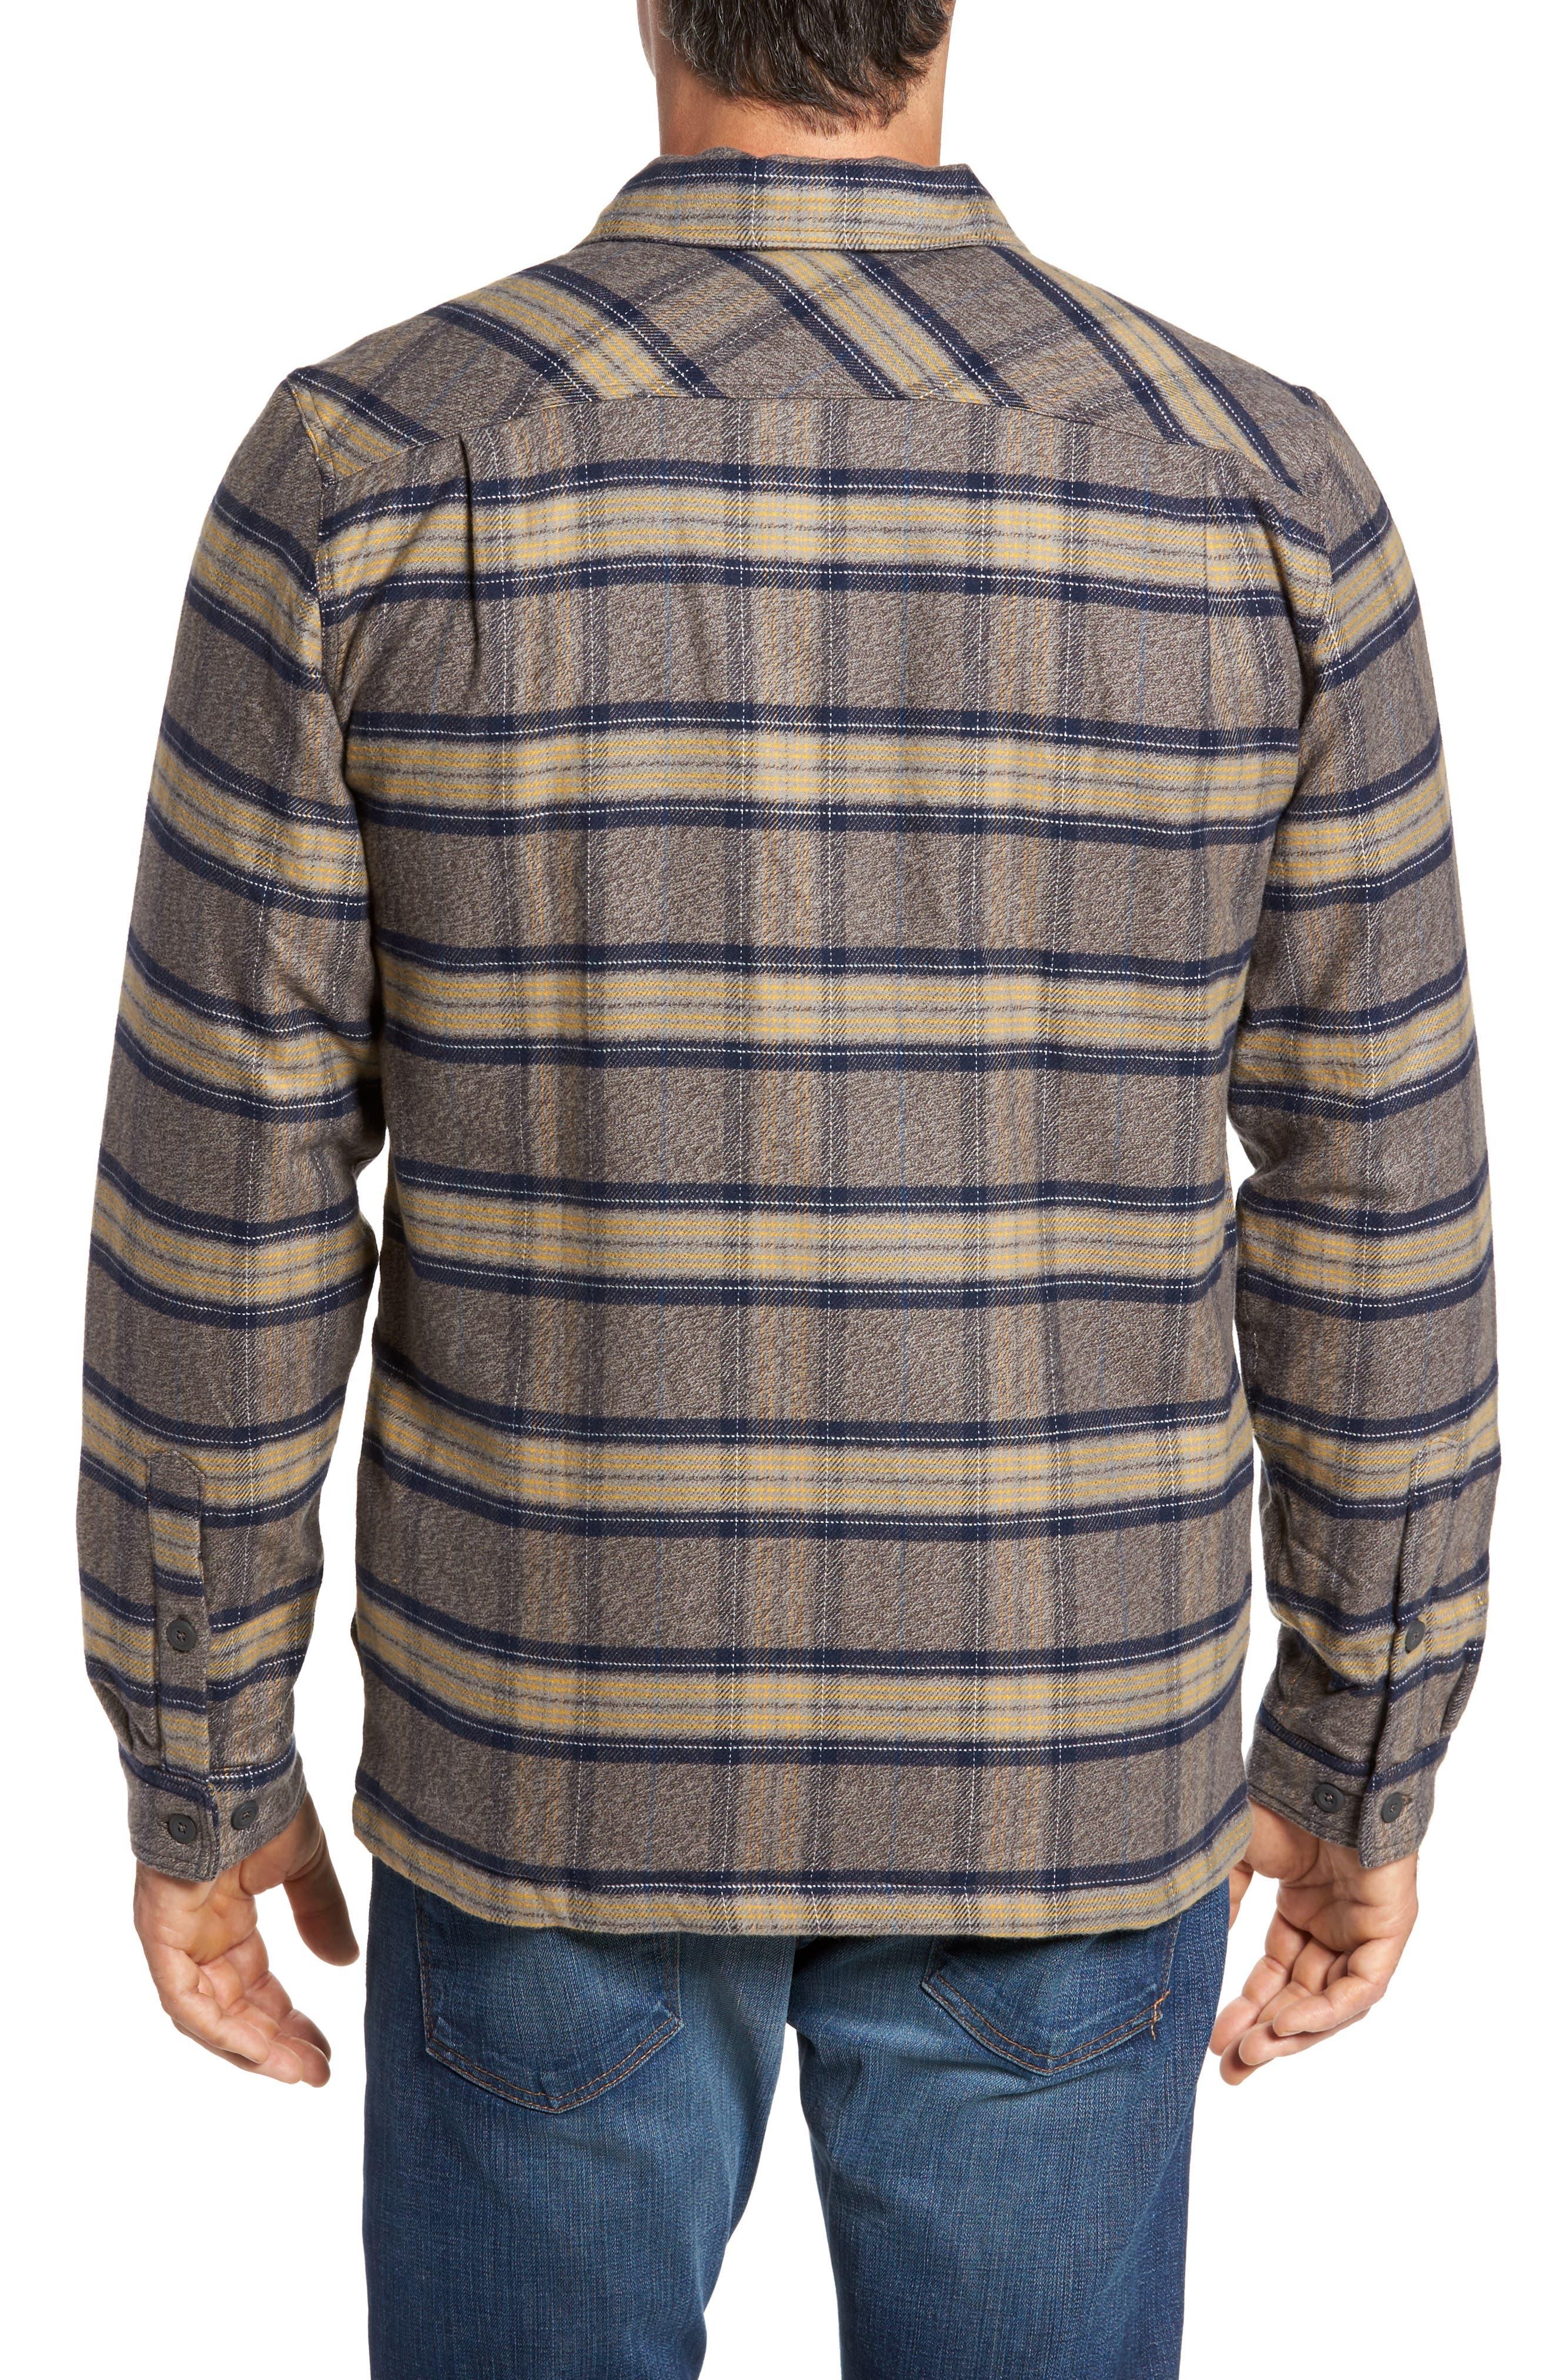 Alternate Image 2  - Patagonia 'Fjord' Flannel Shirt Jacket